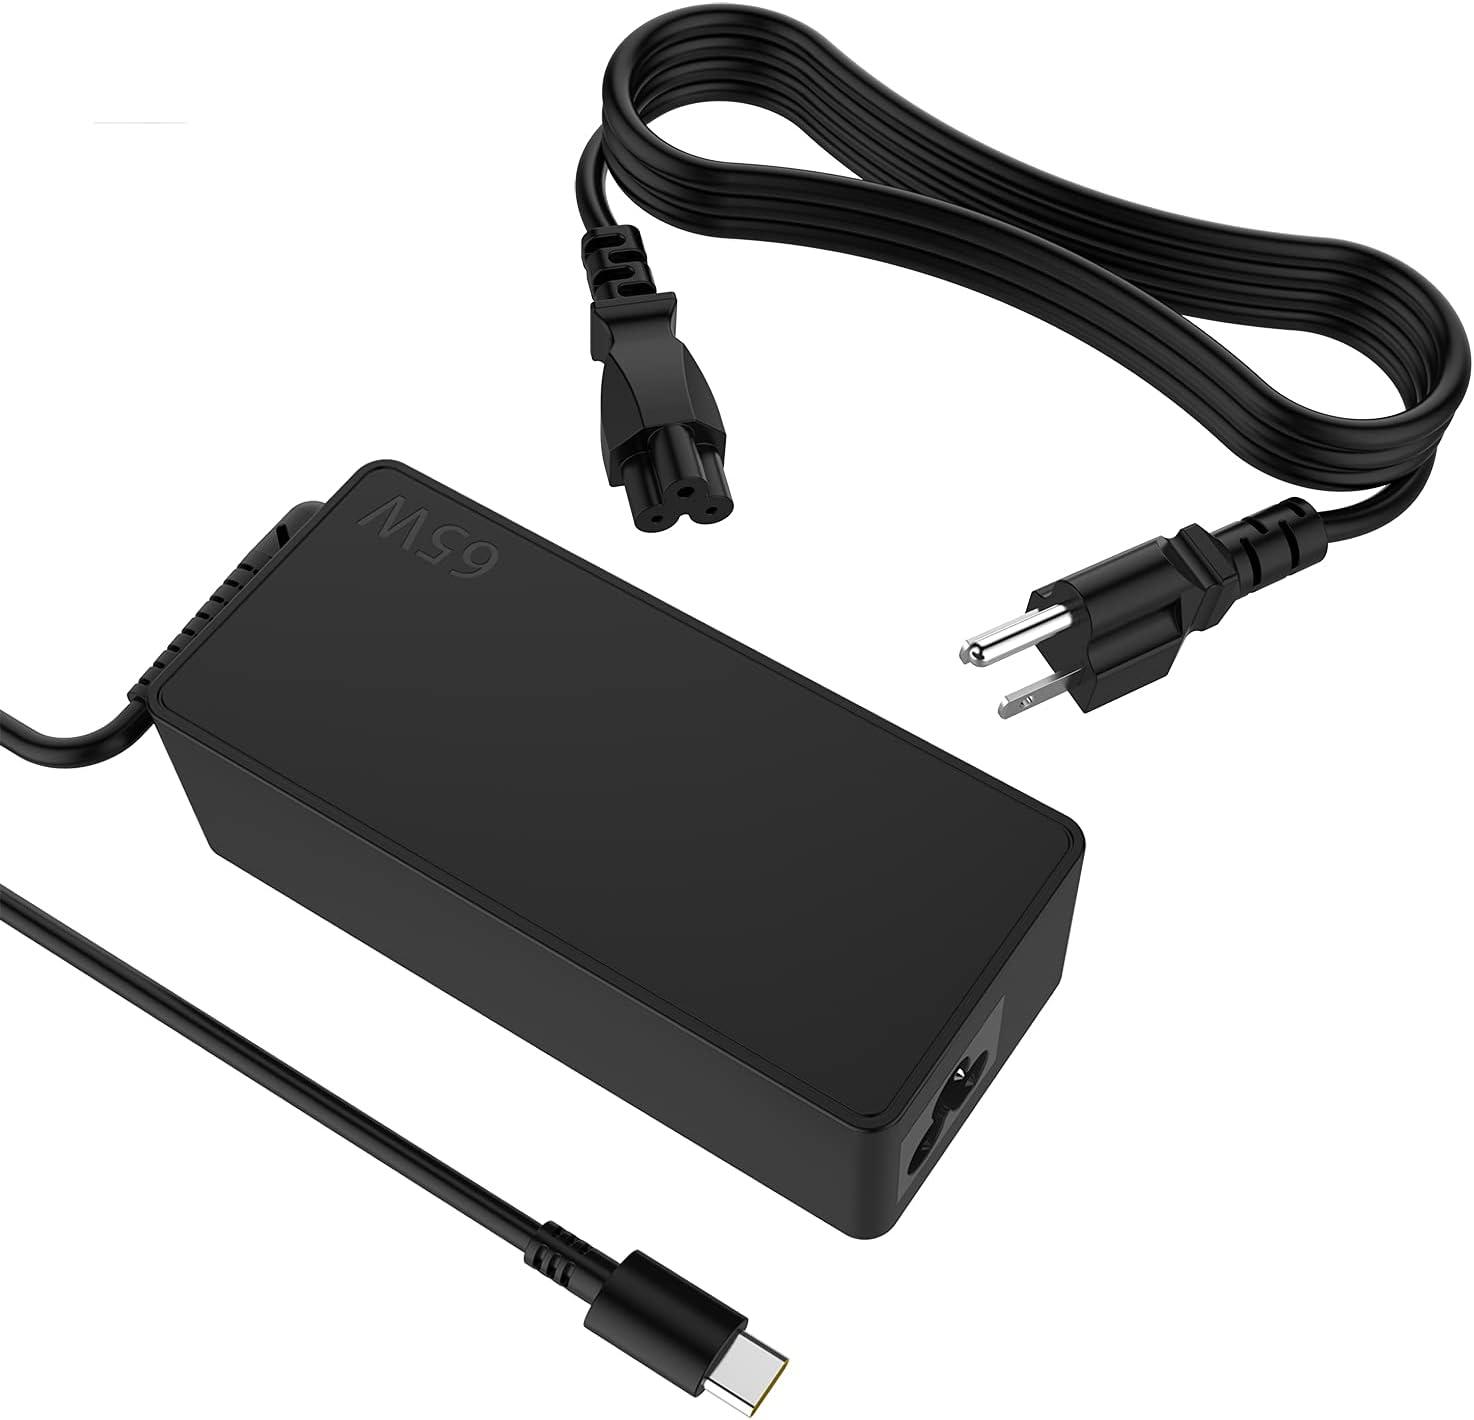 65W USB C Laptop Charger Type C Power Supply Adapter for HP Chromebook 14 13 X360 G5 14-ca051wm 14-ca061dx 14-ca020nr 14-ca060nr 14-ca043cl 14-ca052wm 11 11A G6 G7 G8 EE Spectre EliteBook by Kepmem